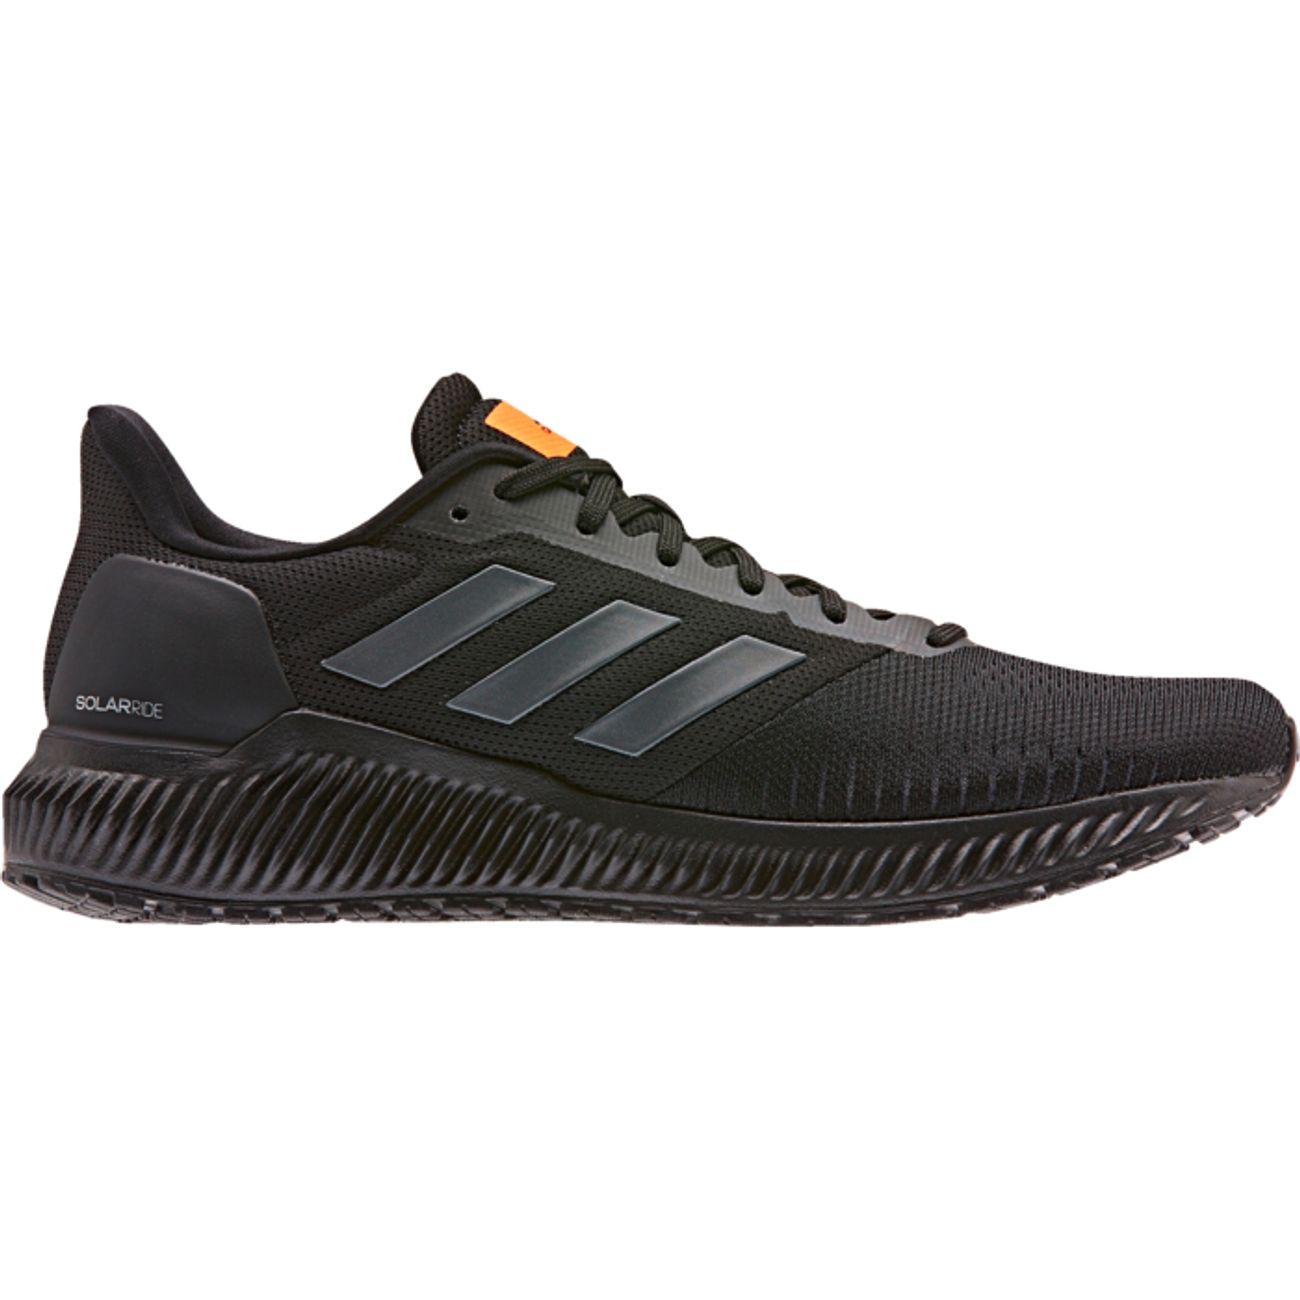 Chaussures Running Ride Homme Basses M Adidas Solar hotsrCxQdB